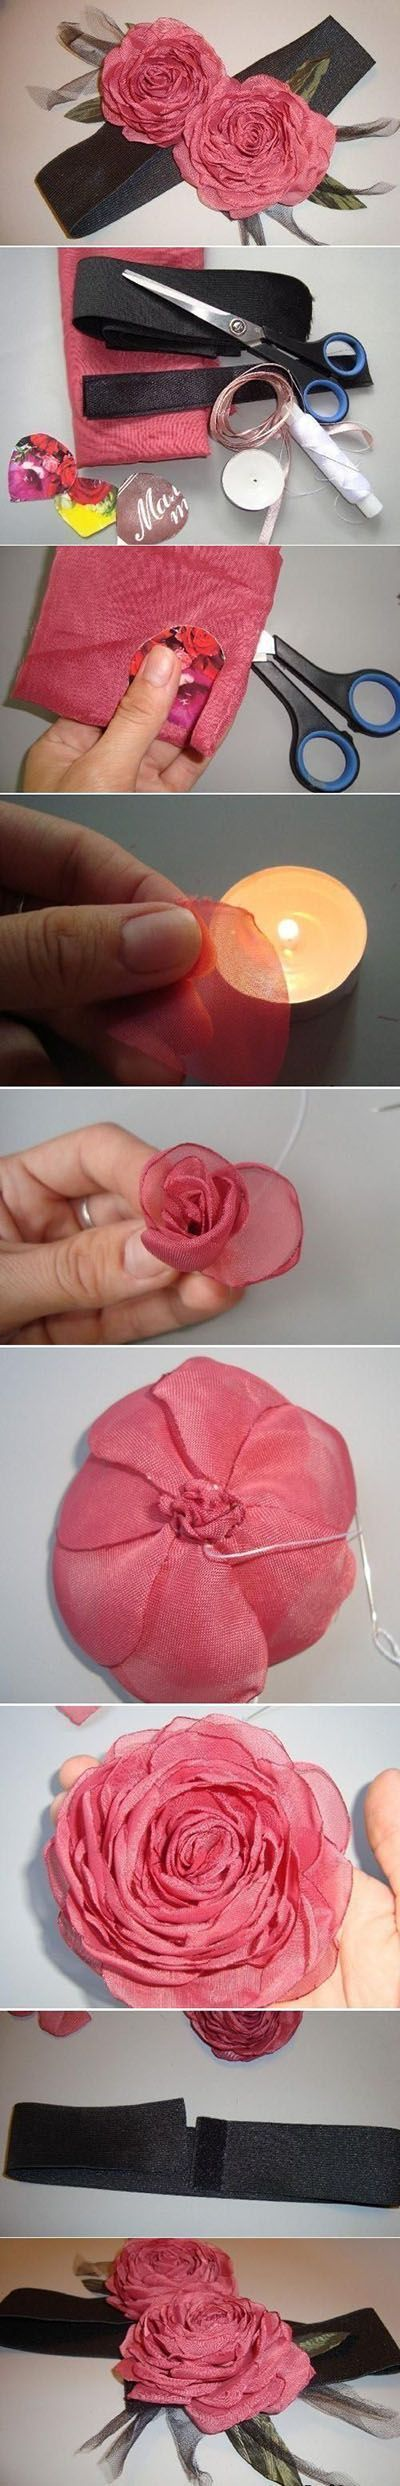 DIY Organza Rose # diy #organza #rose#diy #organza #rose